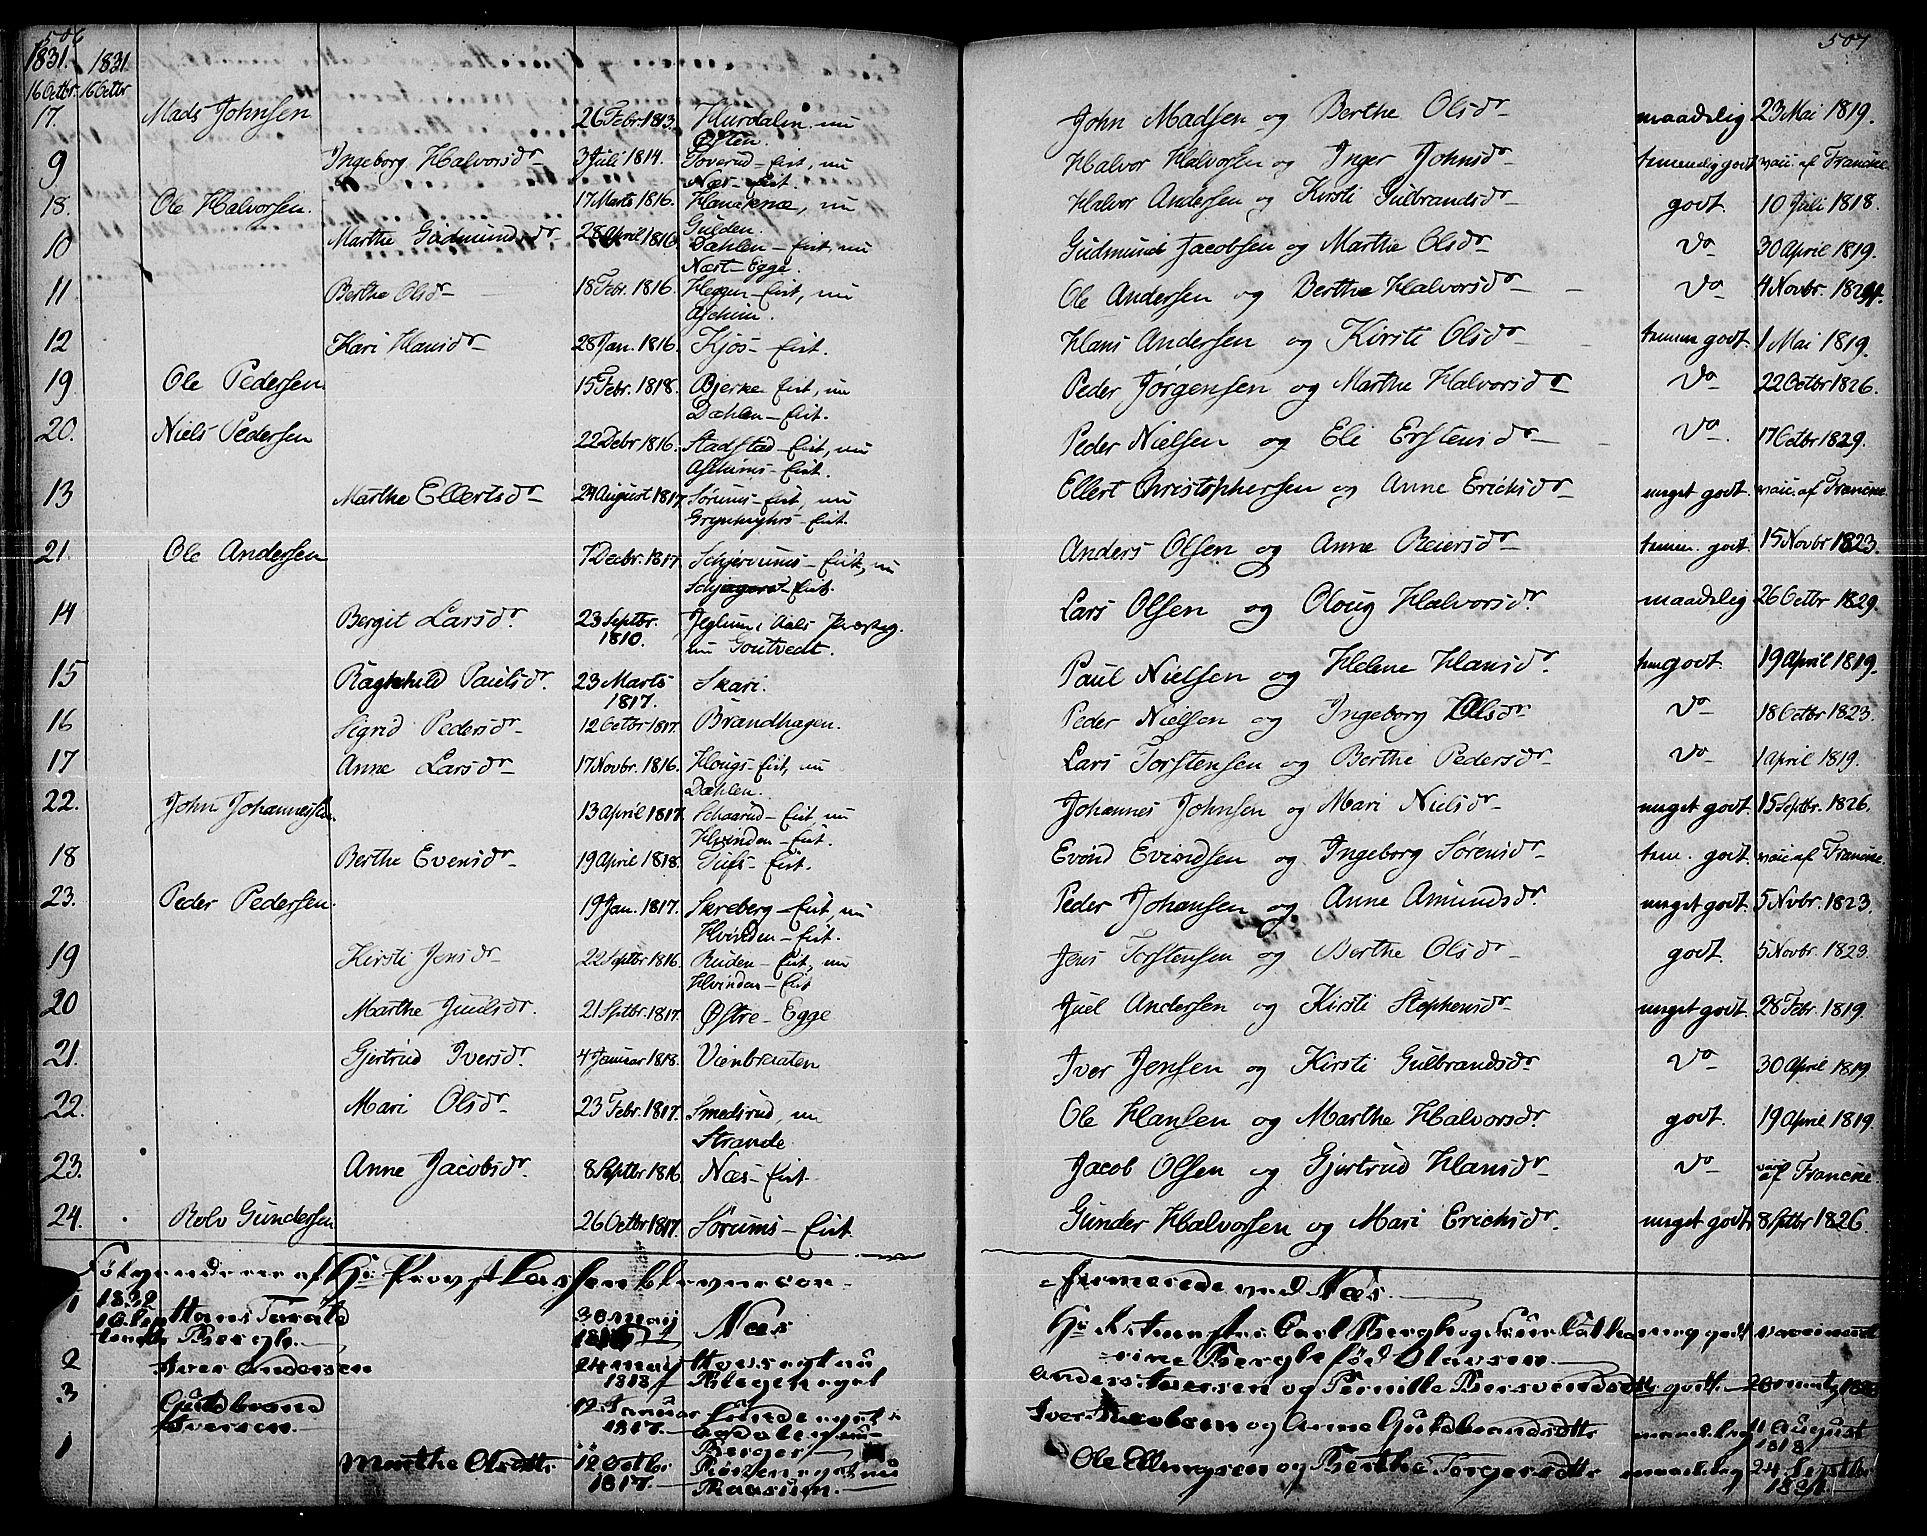 SAH, Gran prestekontor, Ministerialbok nr. 10, 1824-1842, s. 506-507